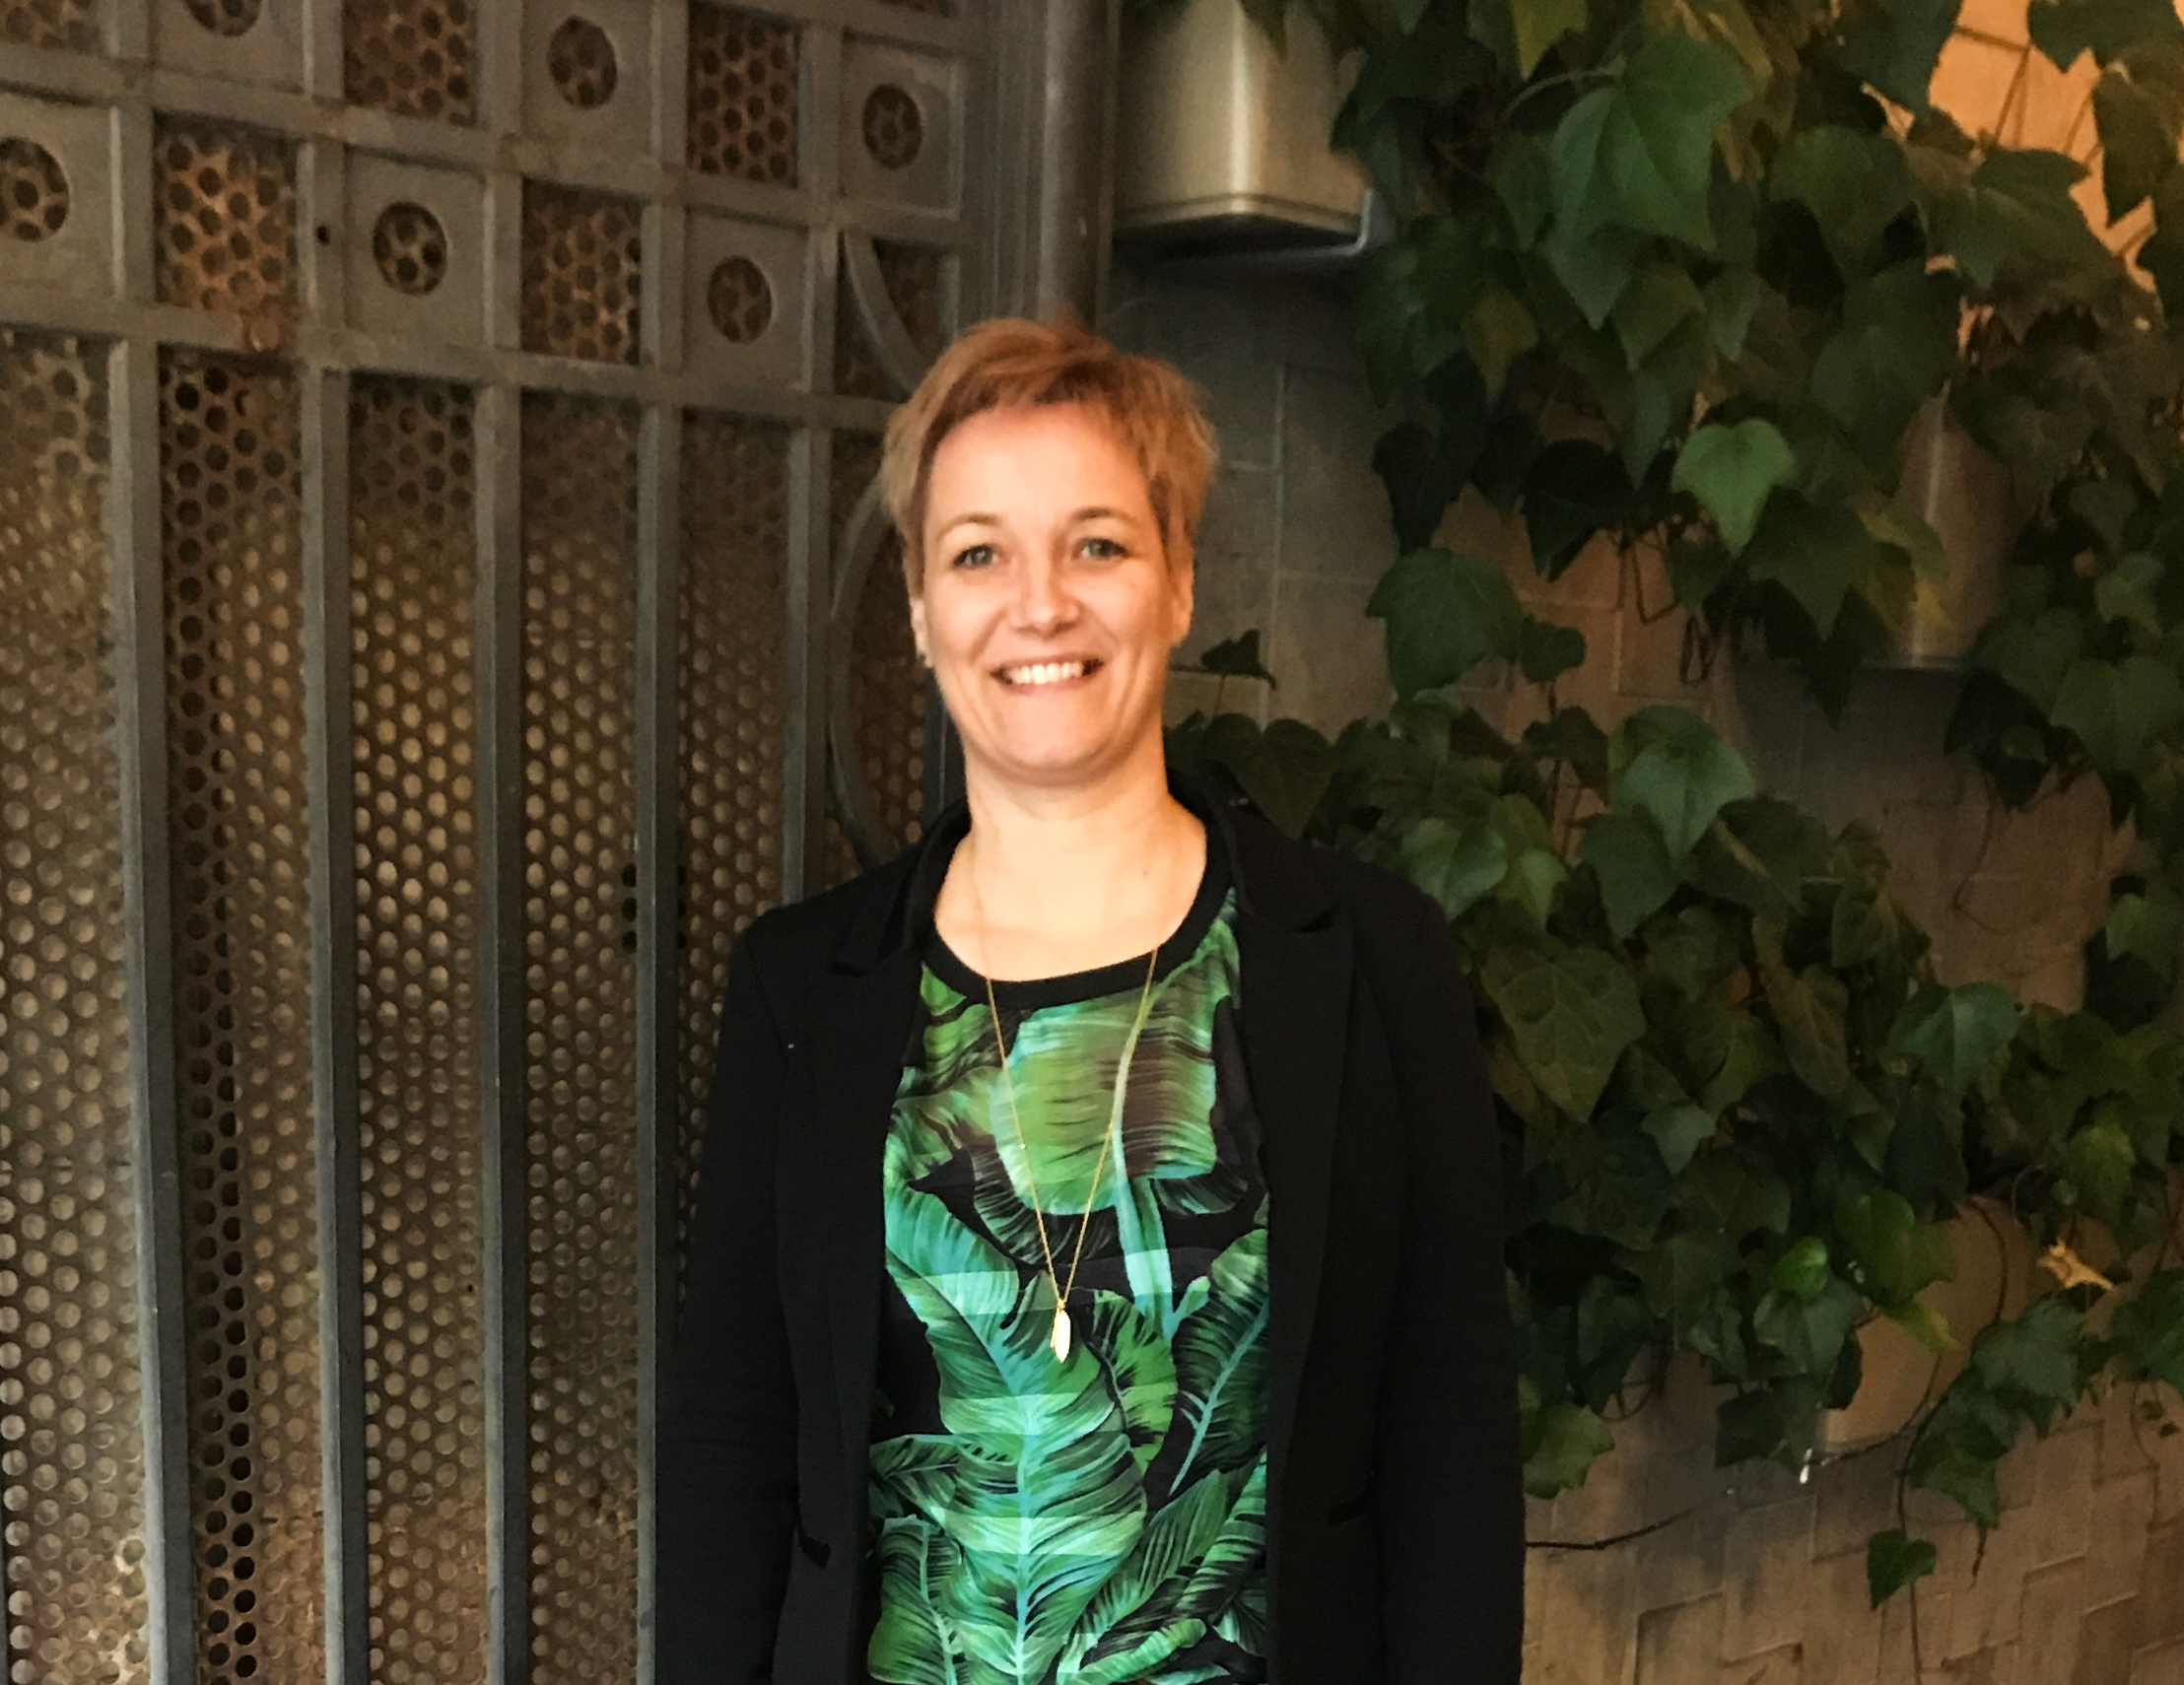 Vicky Maahr Hansen er ny chef for Brøchner-hotellet Avenue. Foto: Brøchner Hotels.